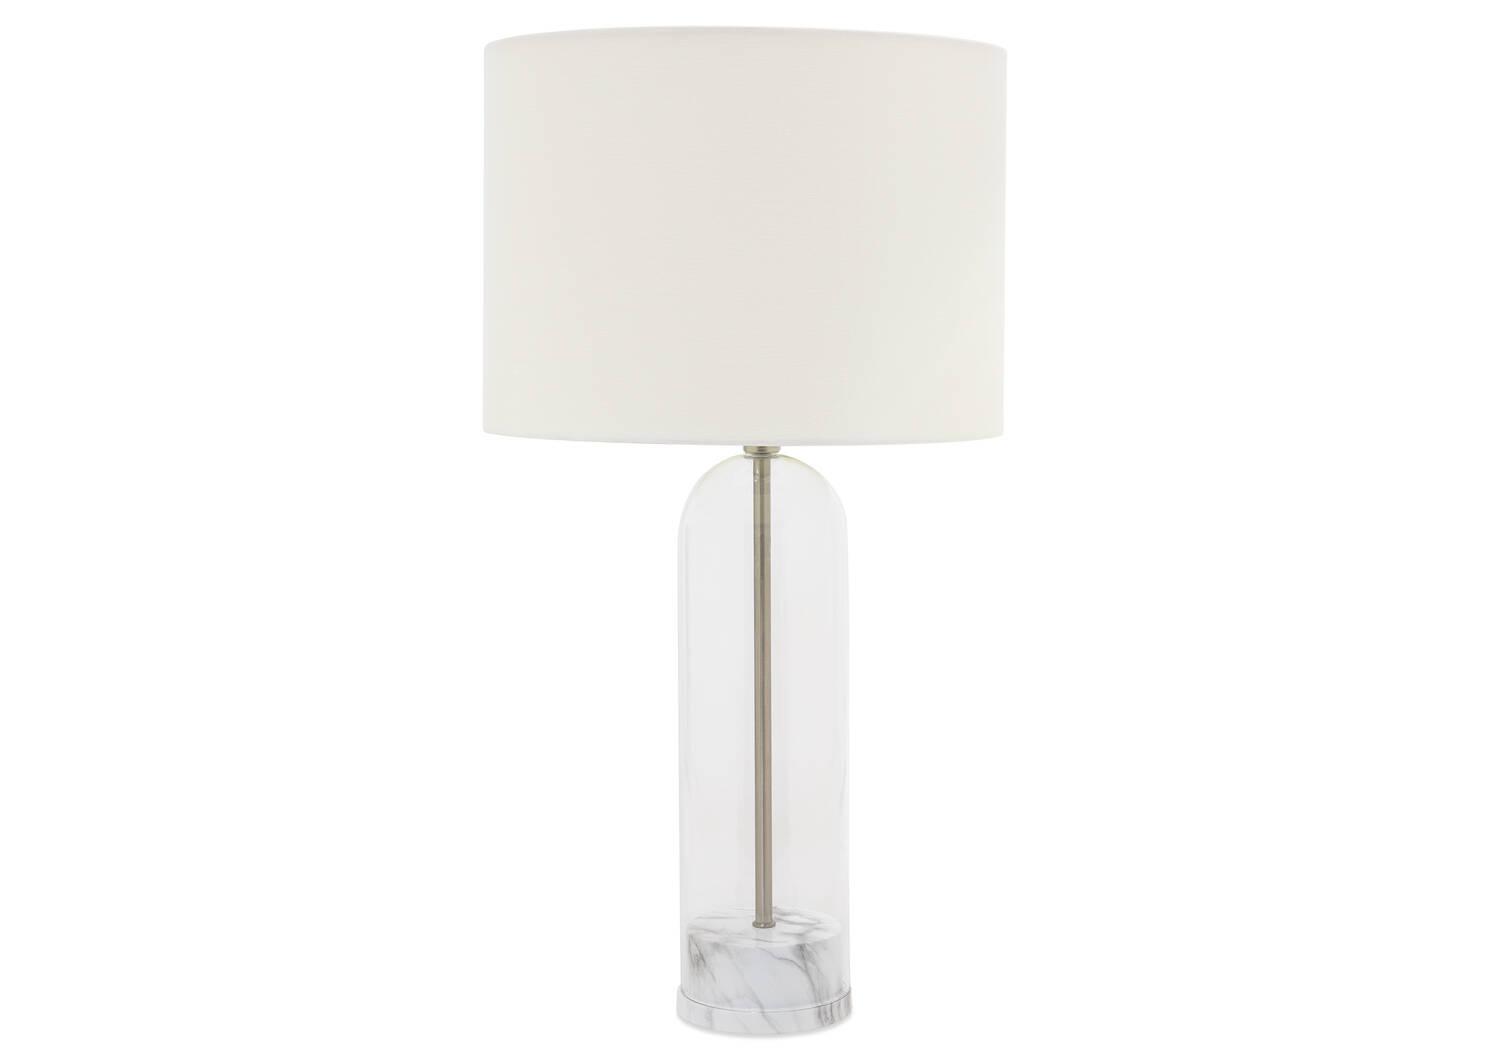 Clarent Table Lamp